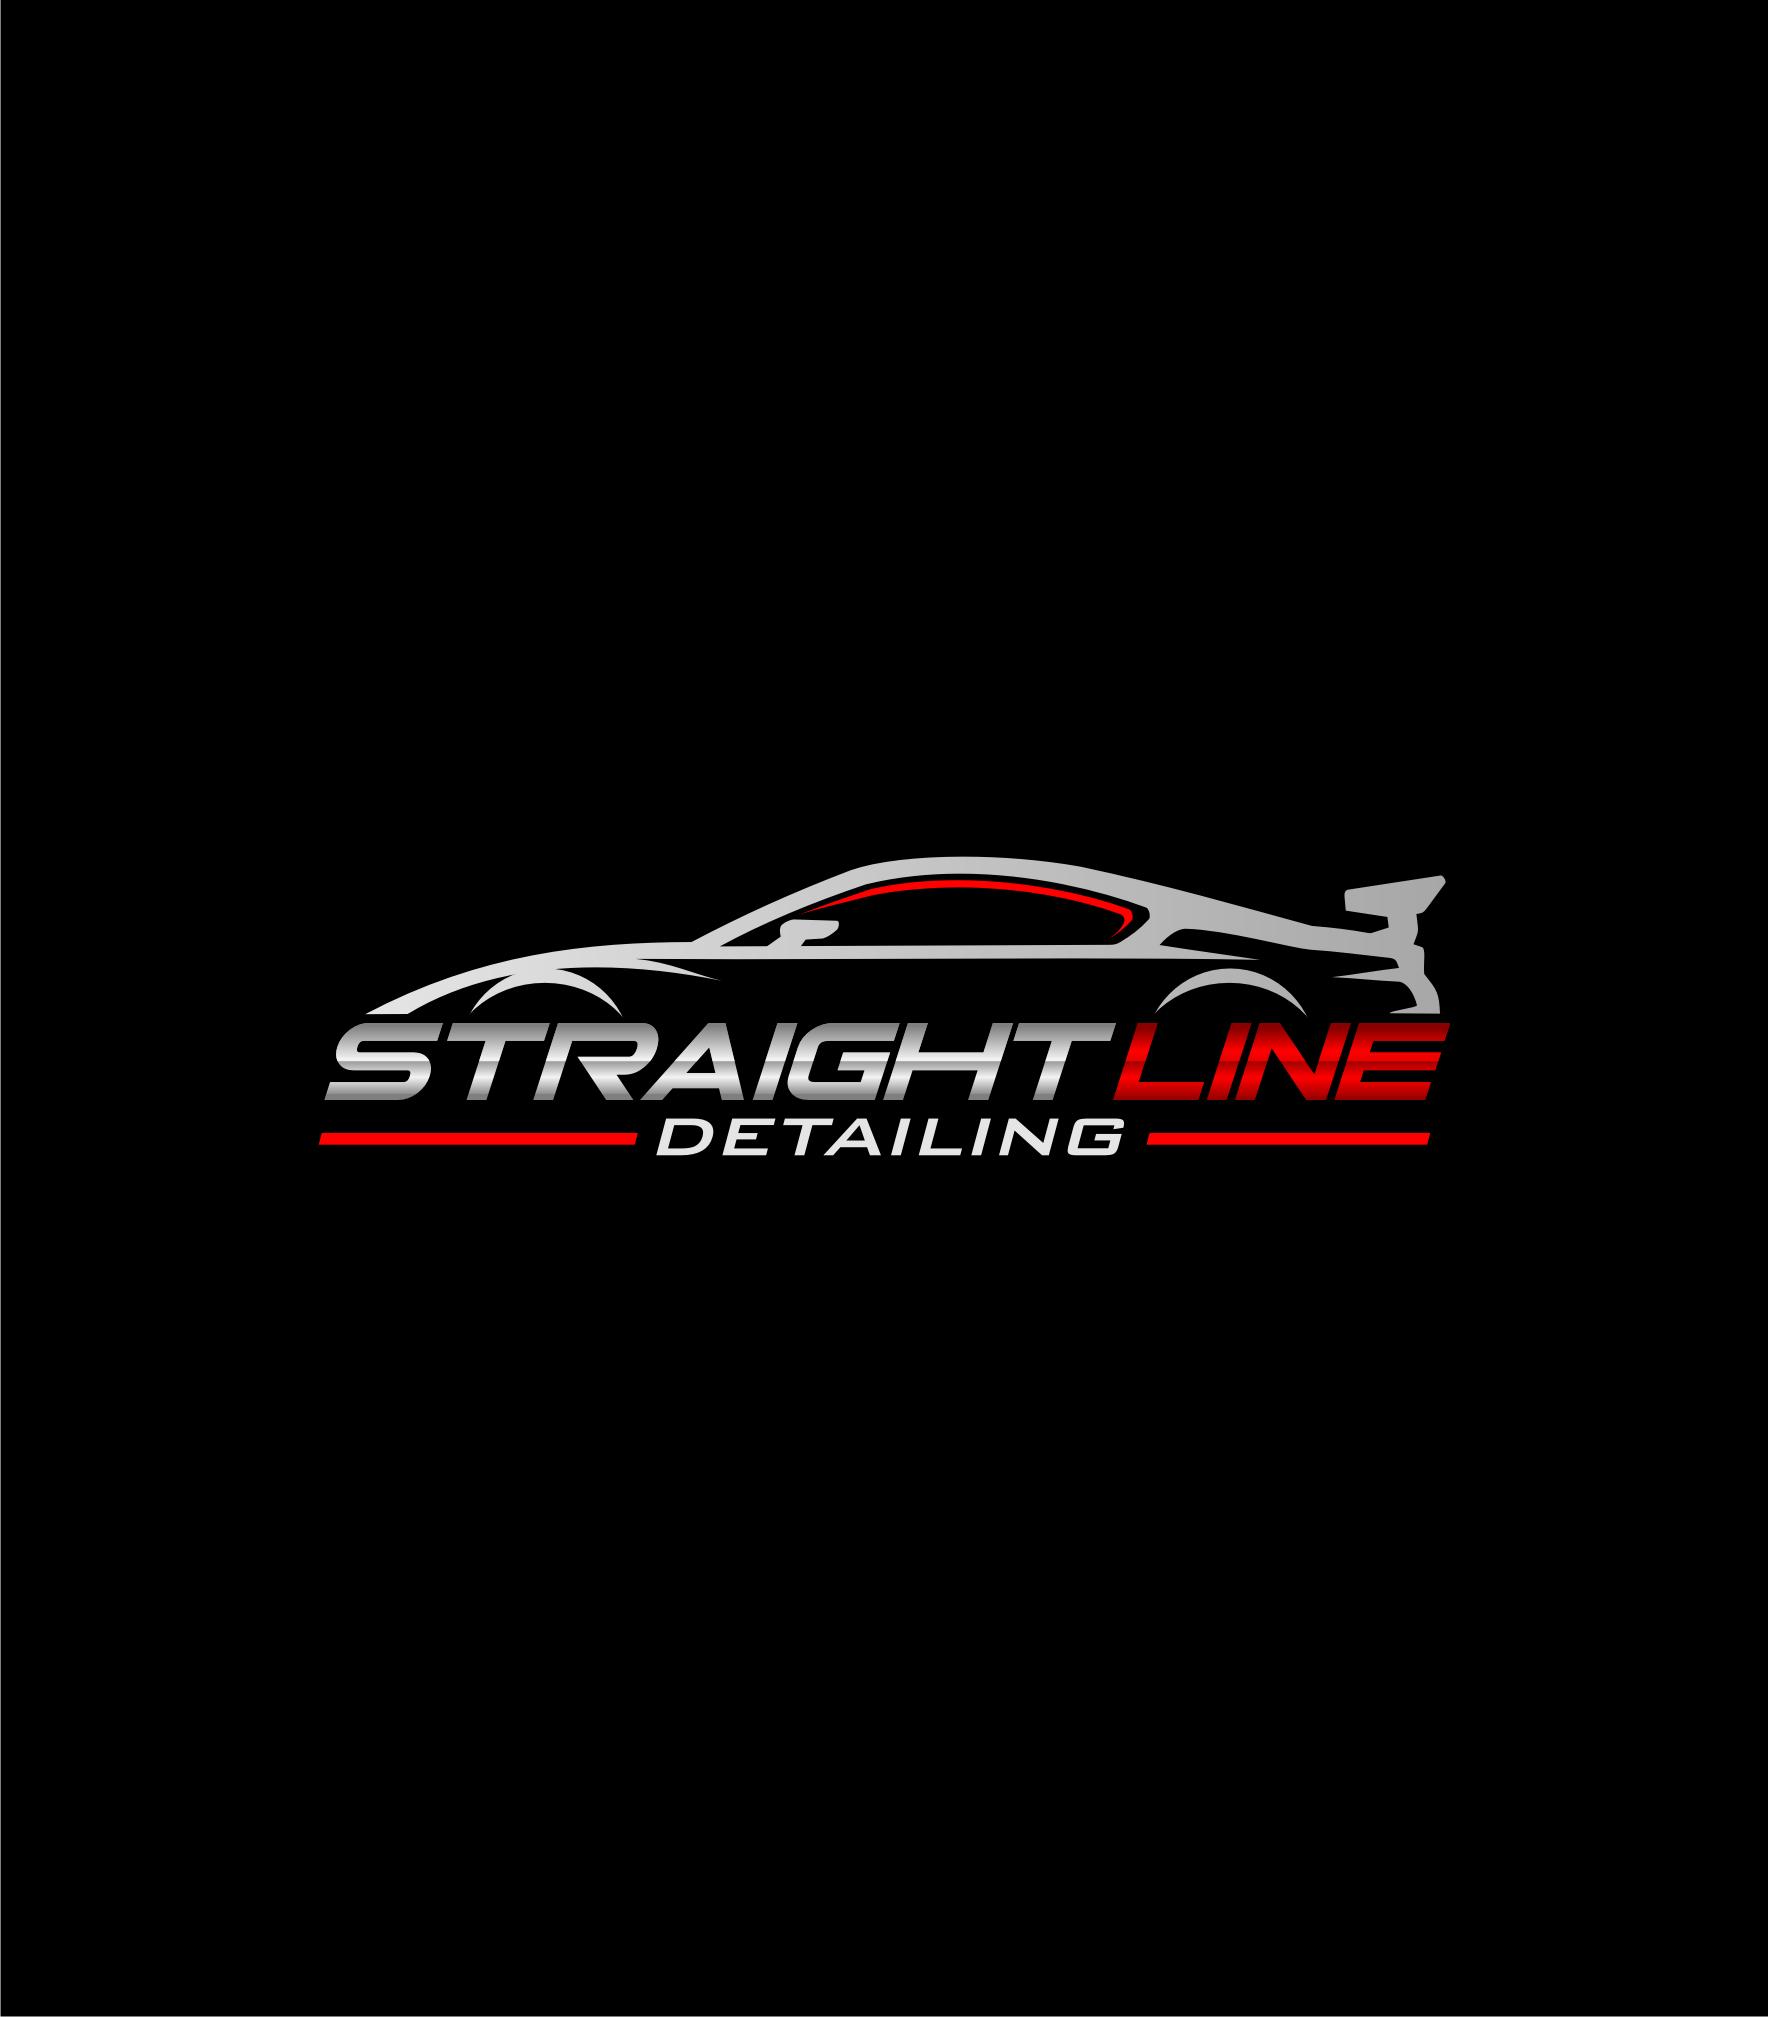 Globalartstudio I Will Design Camera Travel Car Gym Flat Channel App Restaurant Logo For 10 On Fiverr Com In 2021 Car Logo Design Car Logos Automotive Logo [ 2017 x 1768 Pixel ]